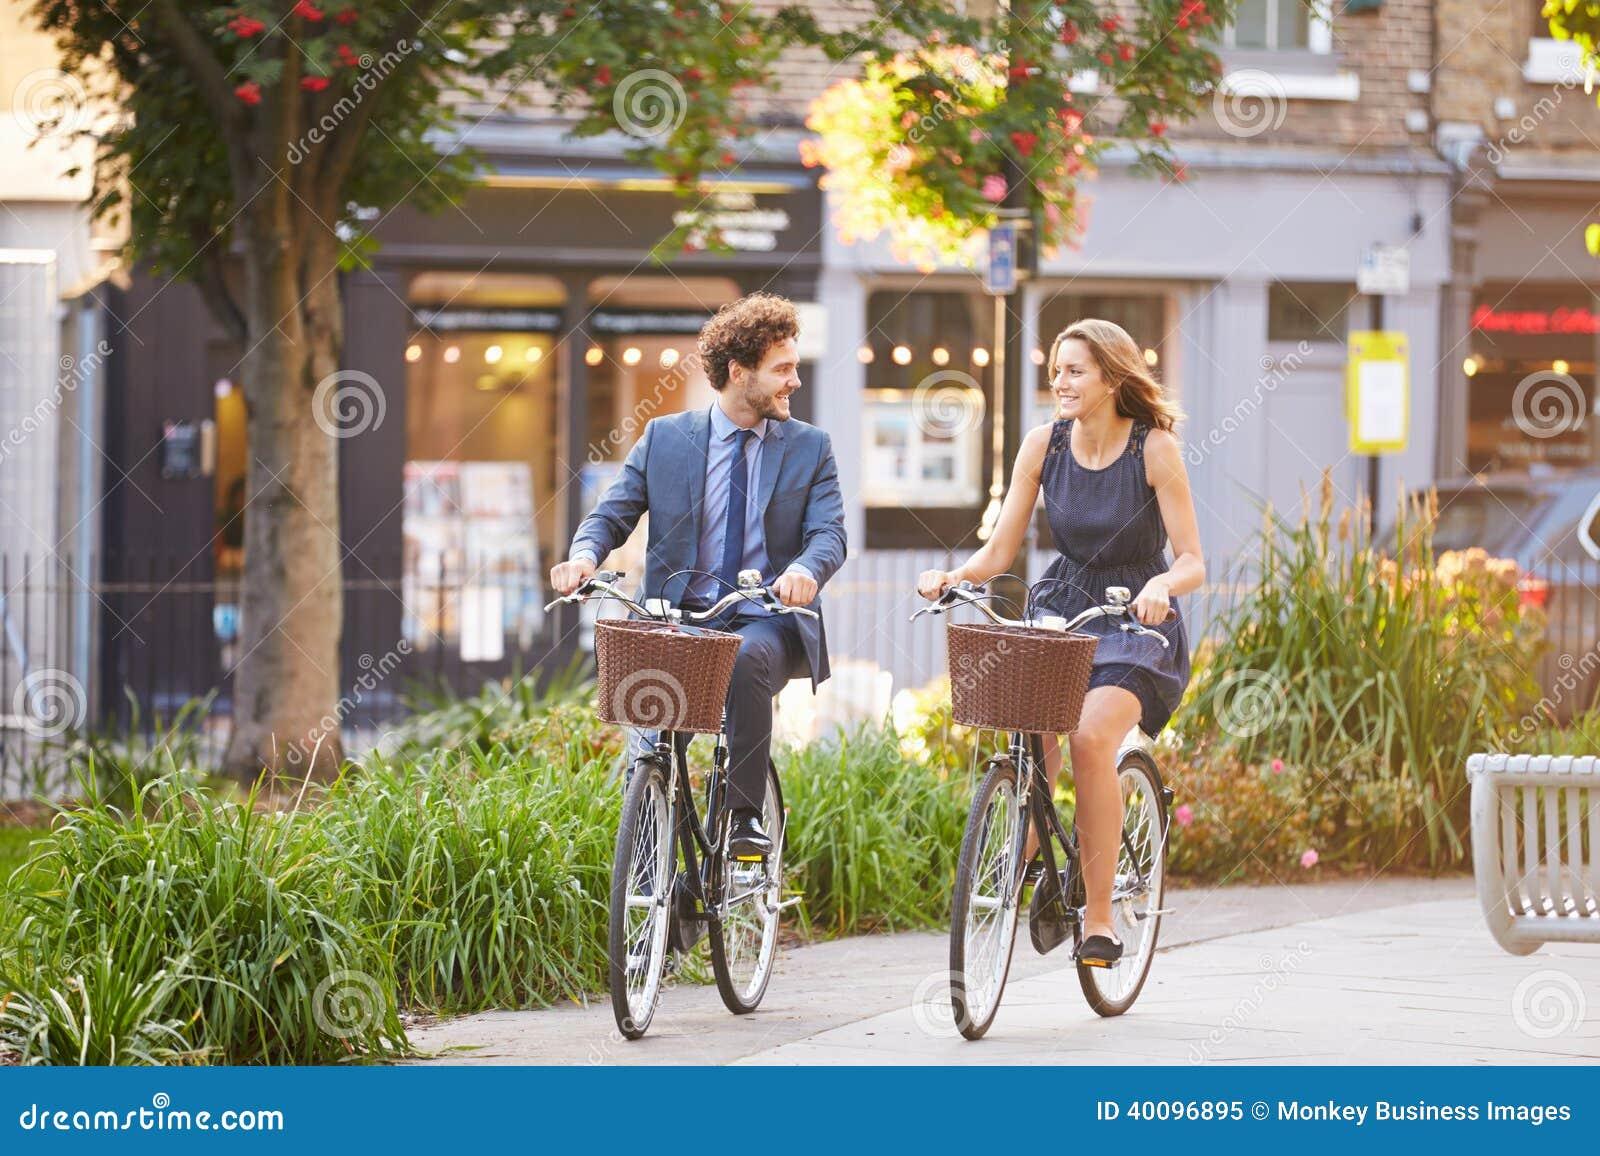 Businesswoman And Businessman Riding Bike Through City